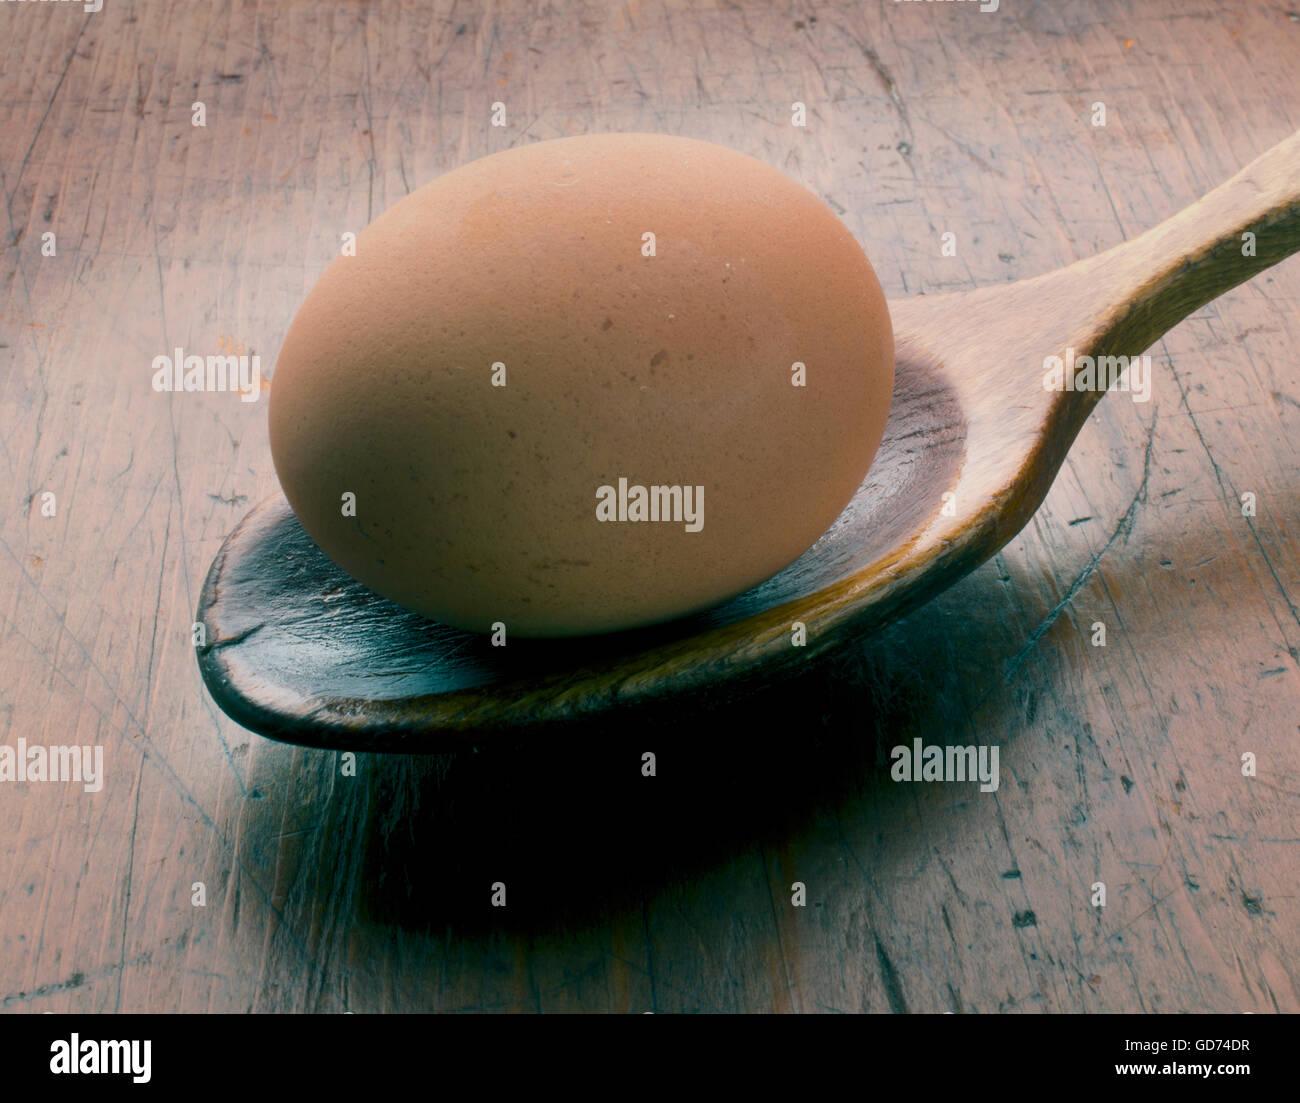 cuillère de bois oeuf Photo Stock